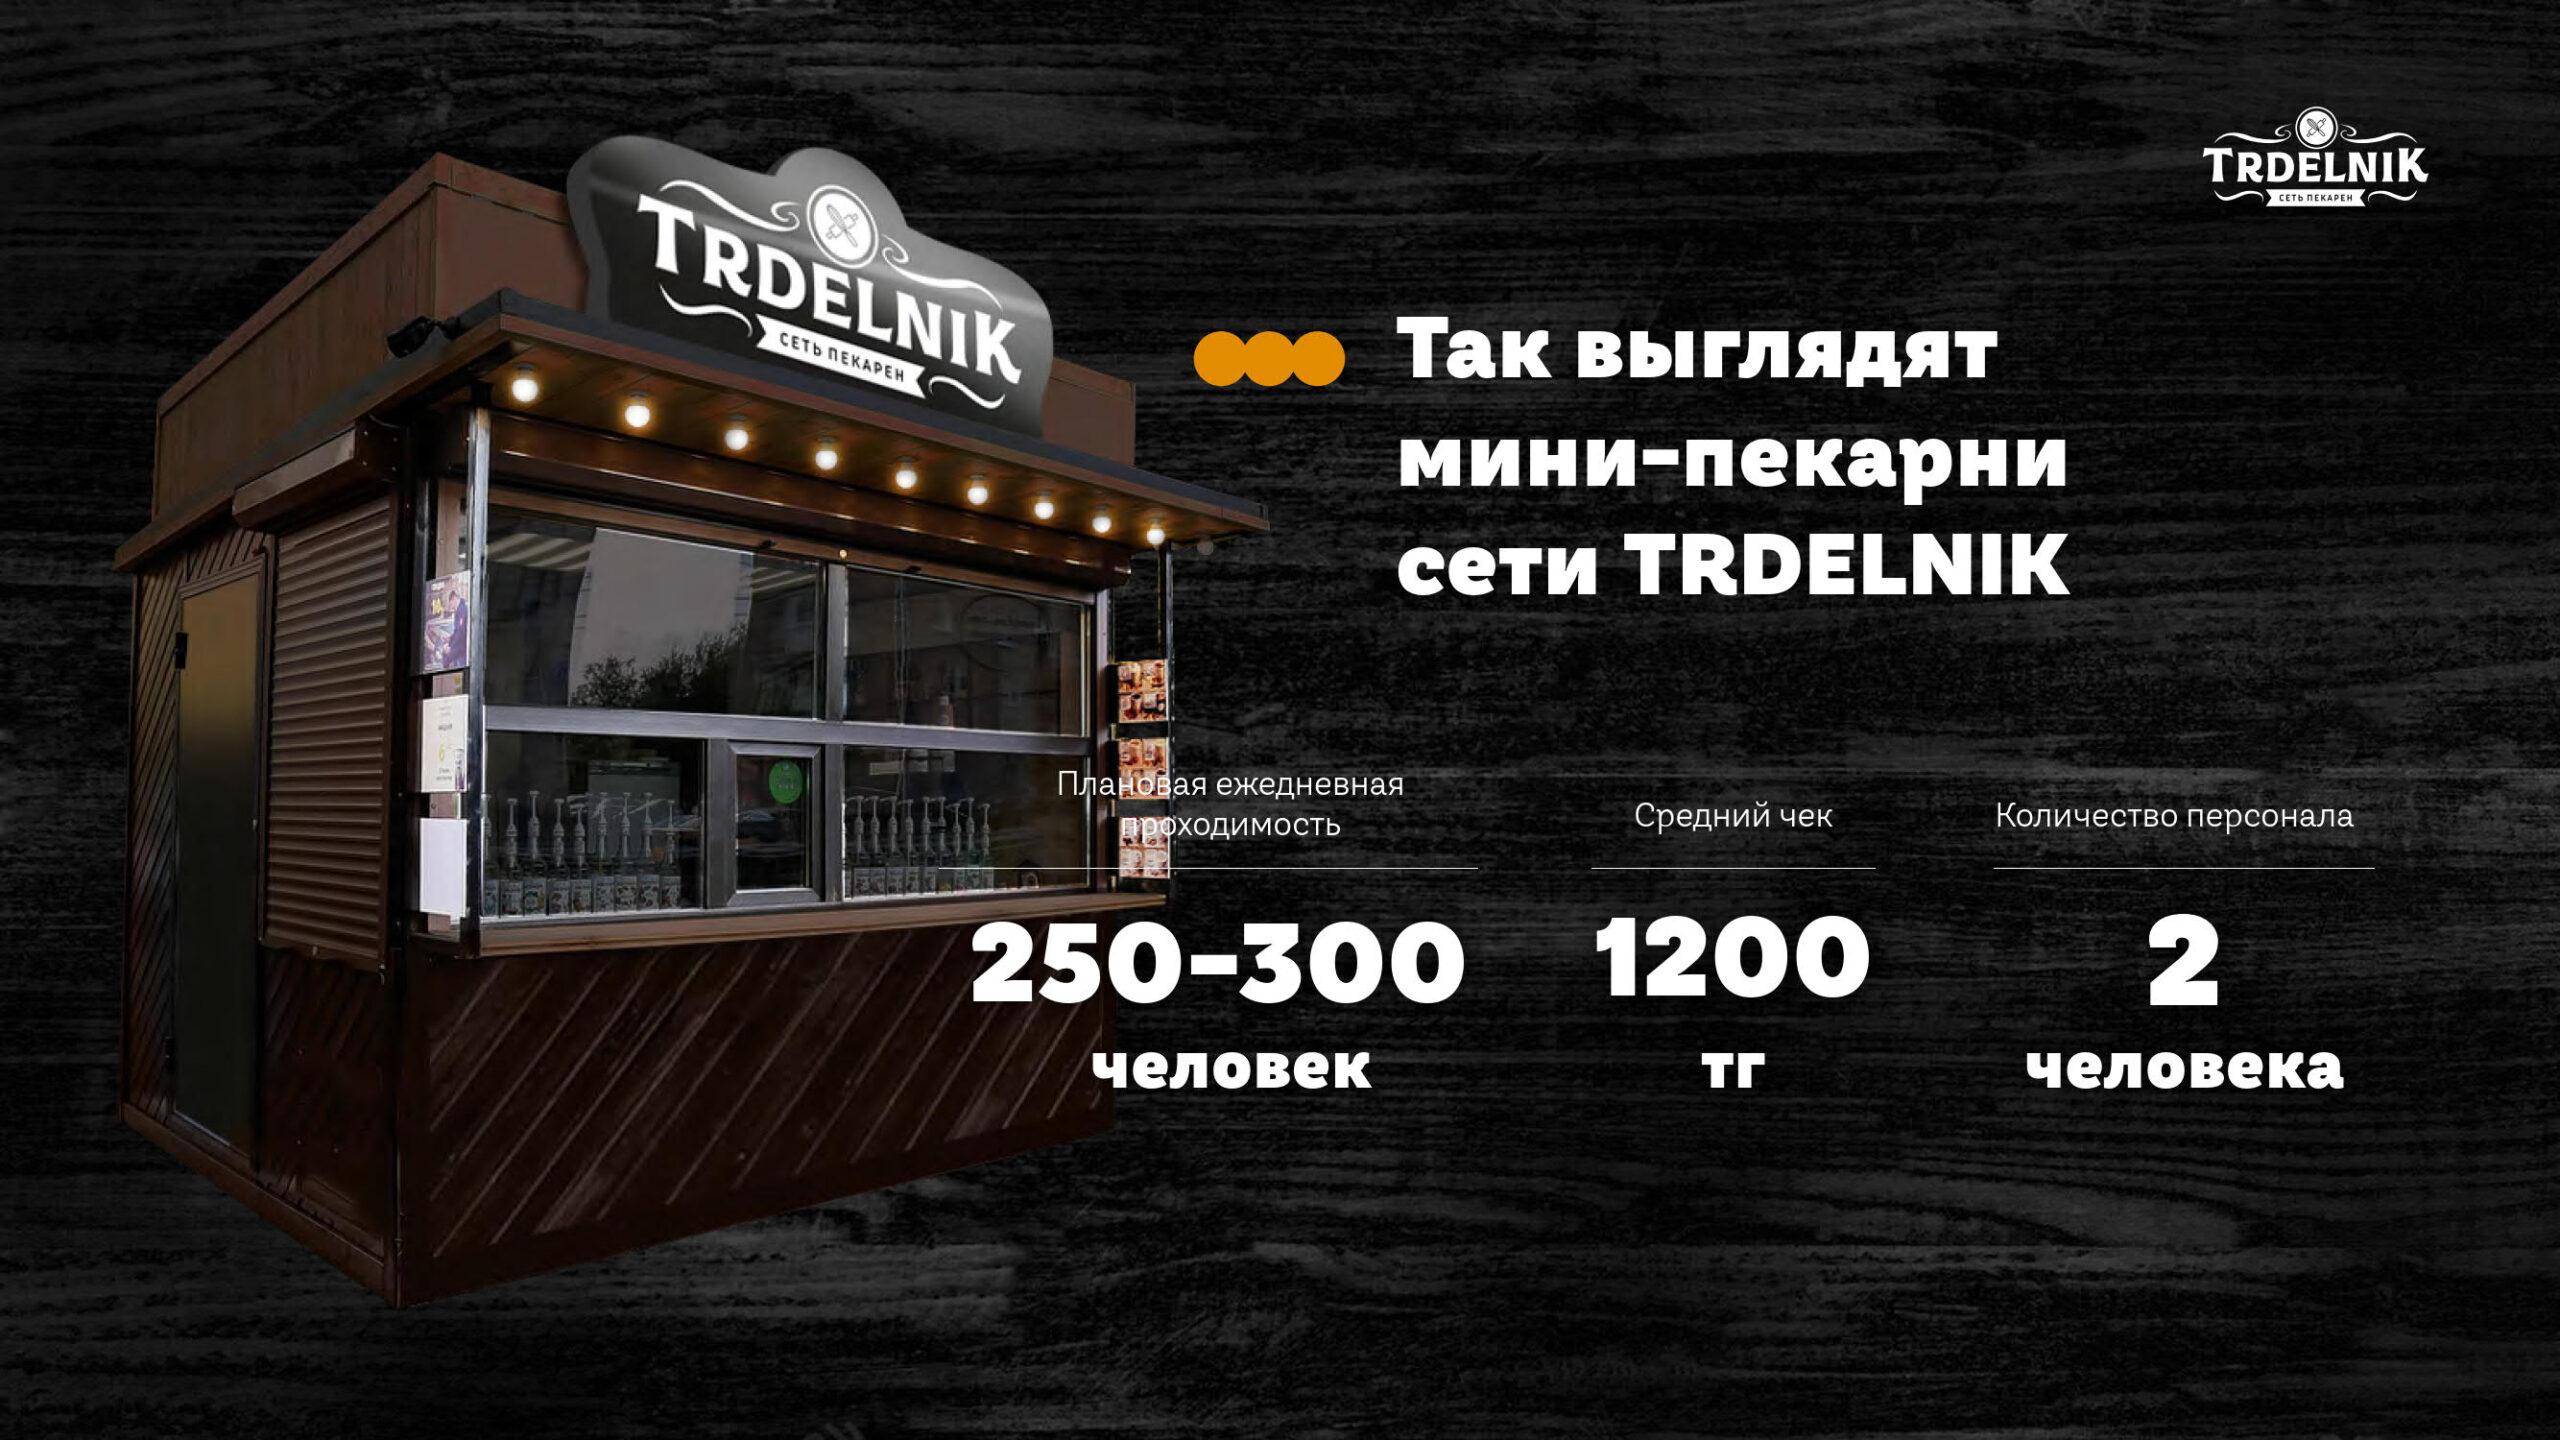 Презентация сети мини-пекарен Trdelnik для аренды в ТРЦ